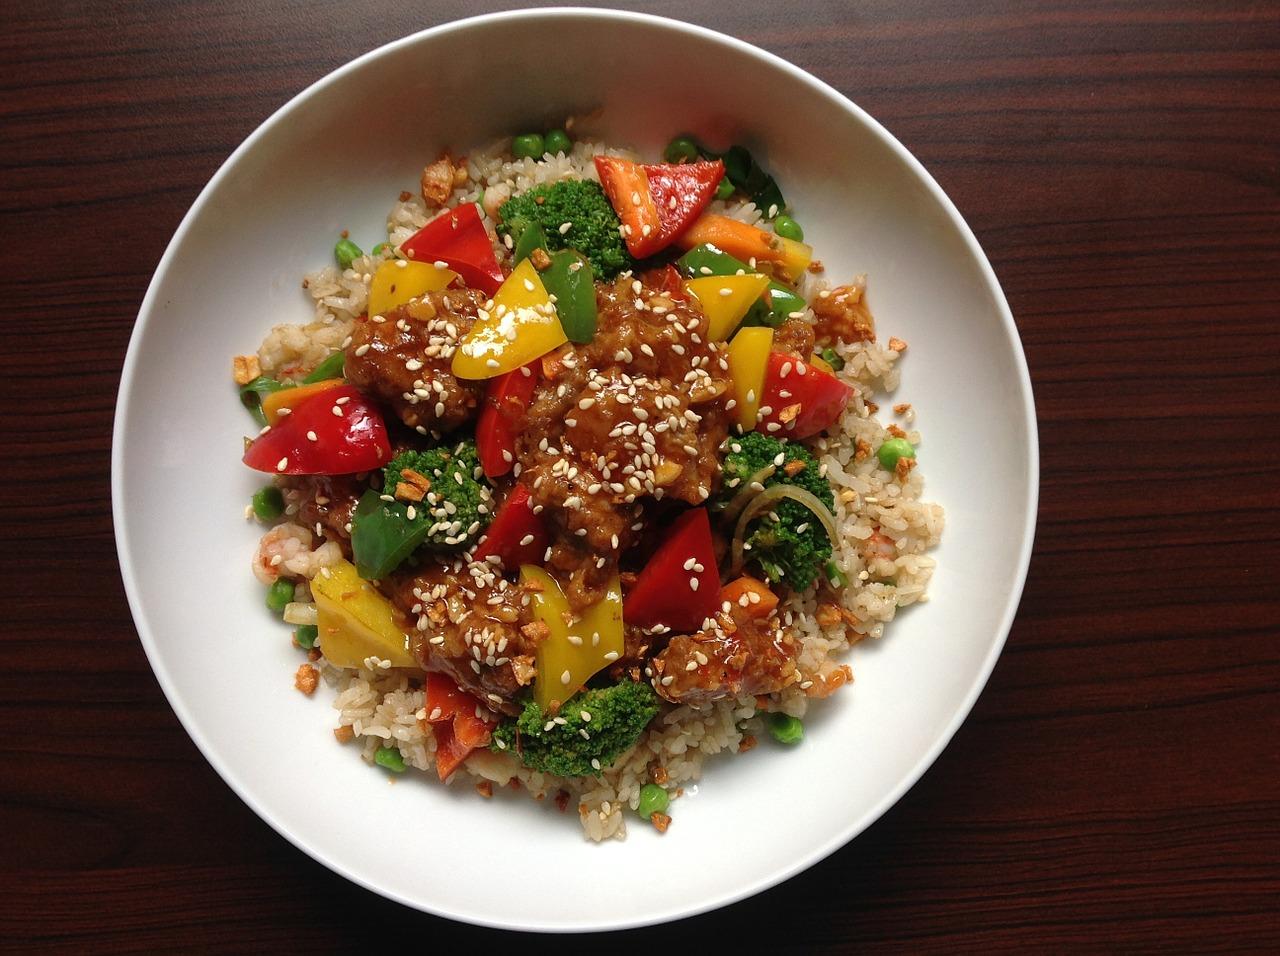 Receta de ensalada de arroz blanco